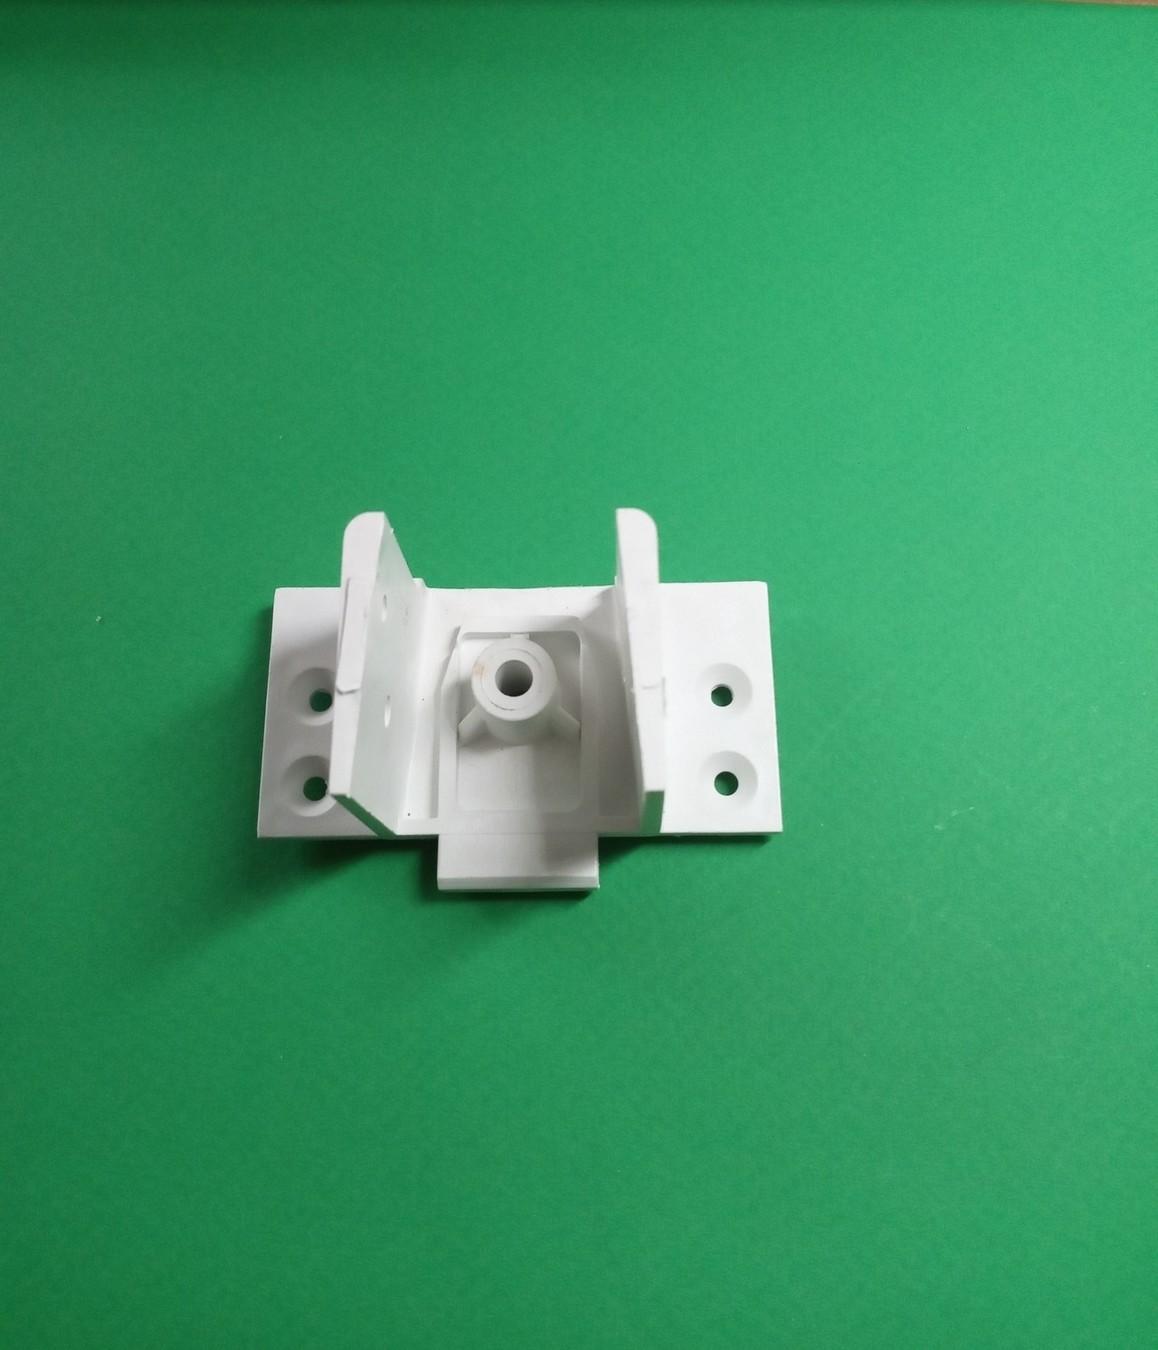 Соединители импоста Openteck (пластик) - 2,40 грн/шт